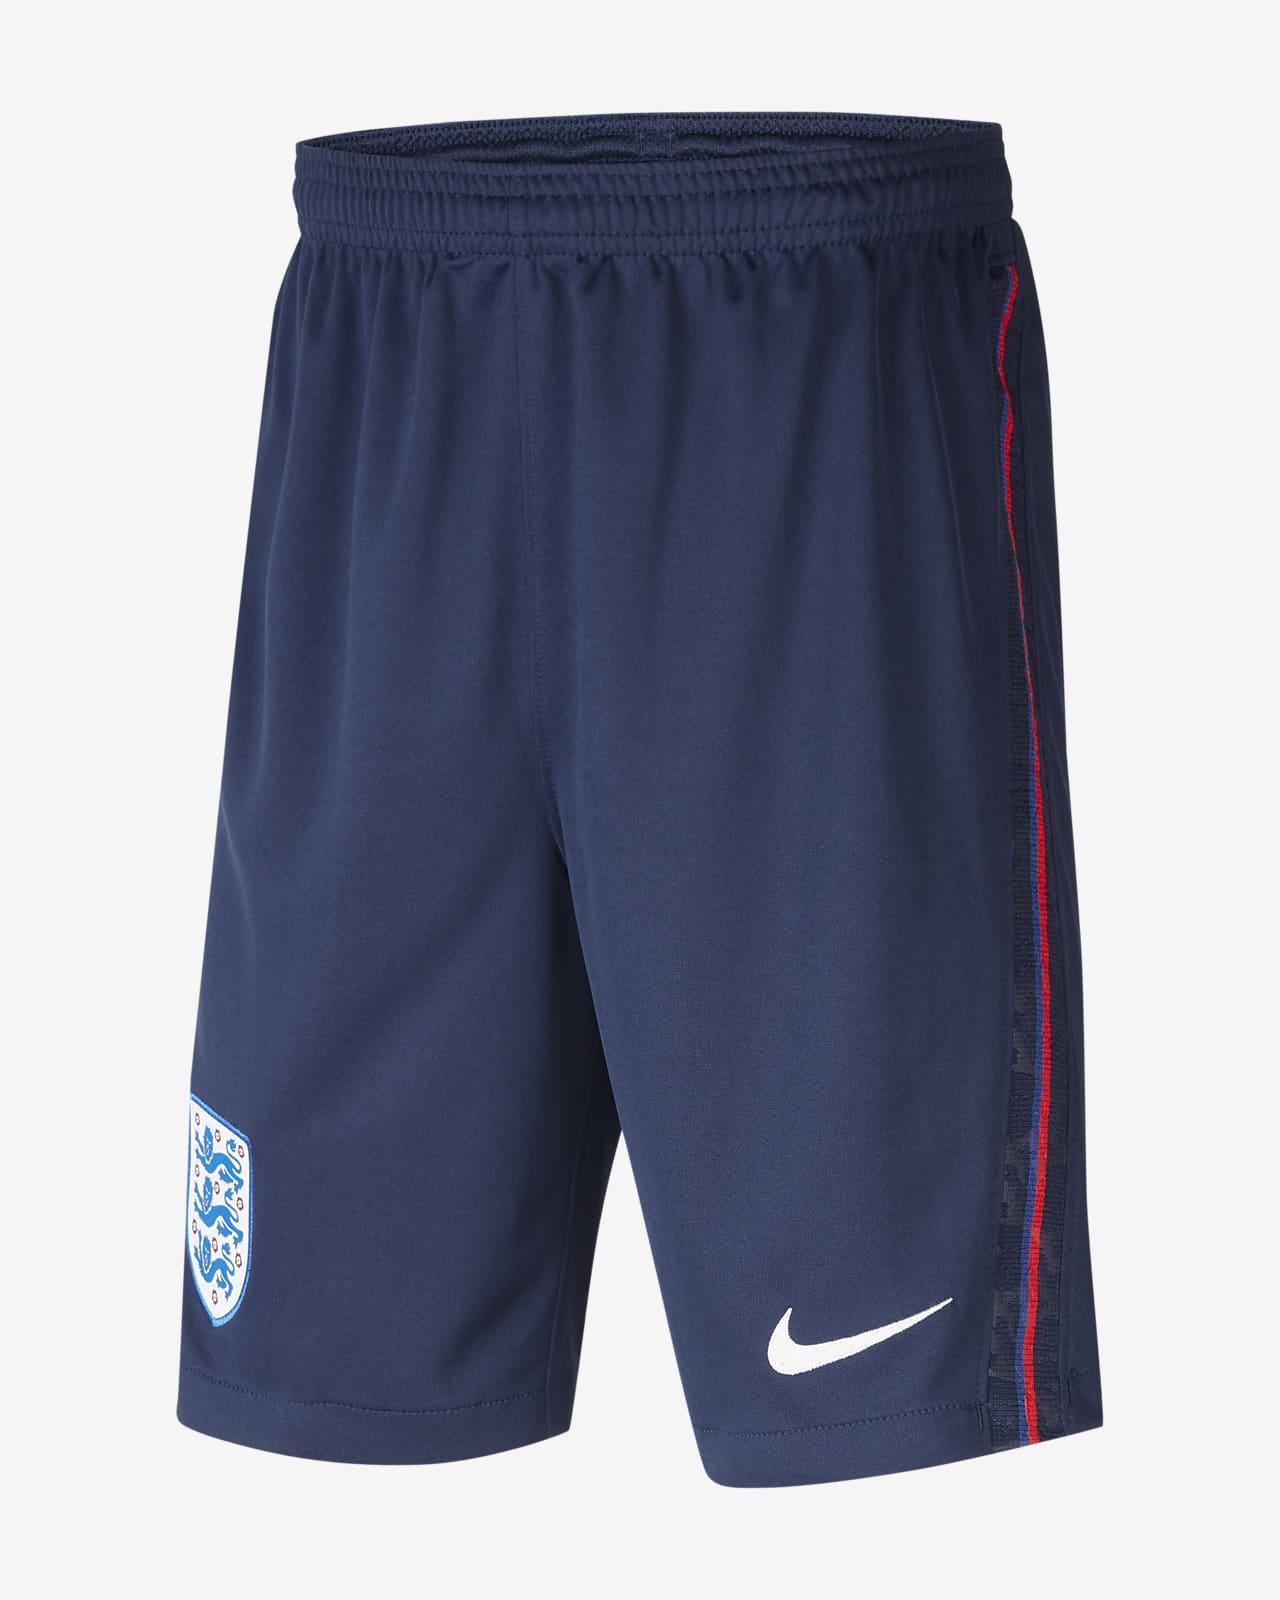 England Stadium 2020 Home Older Kids' Football Shorts